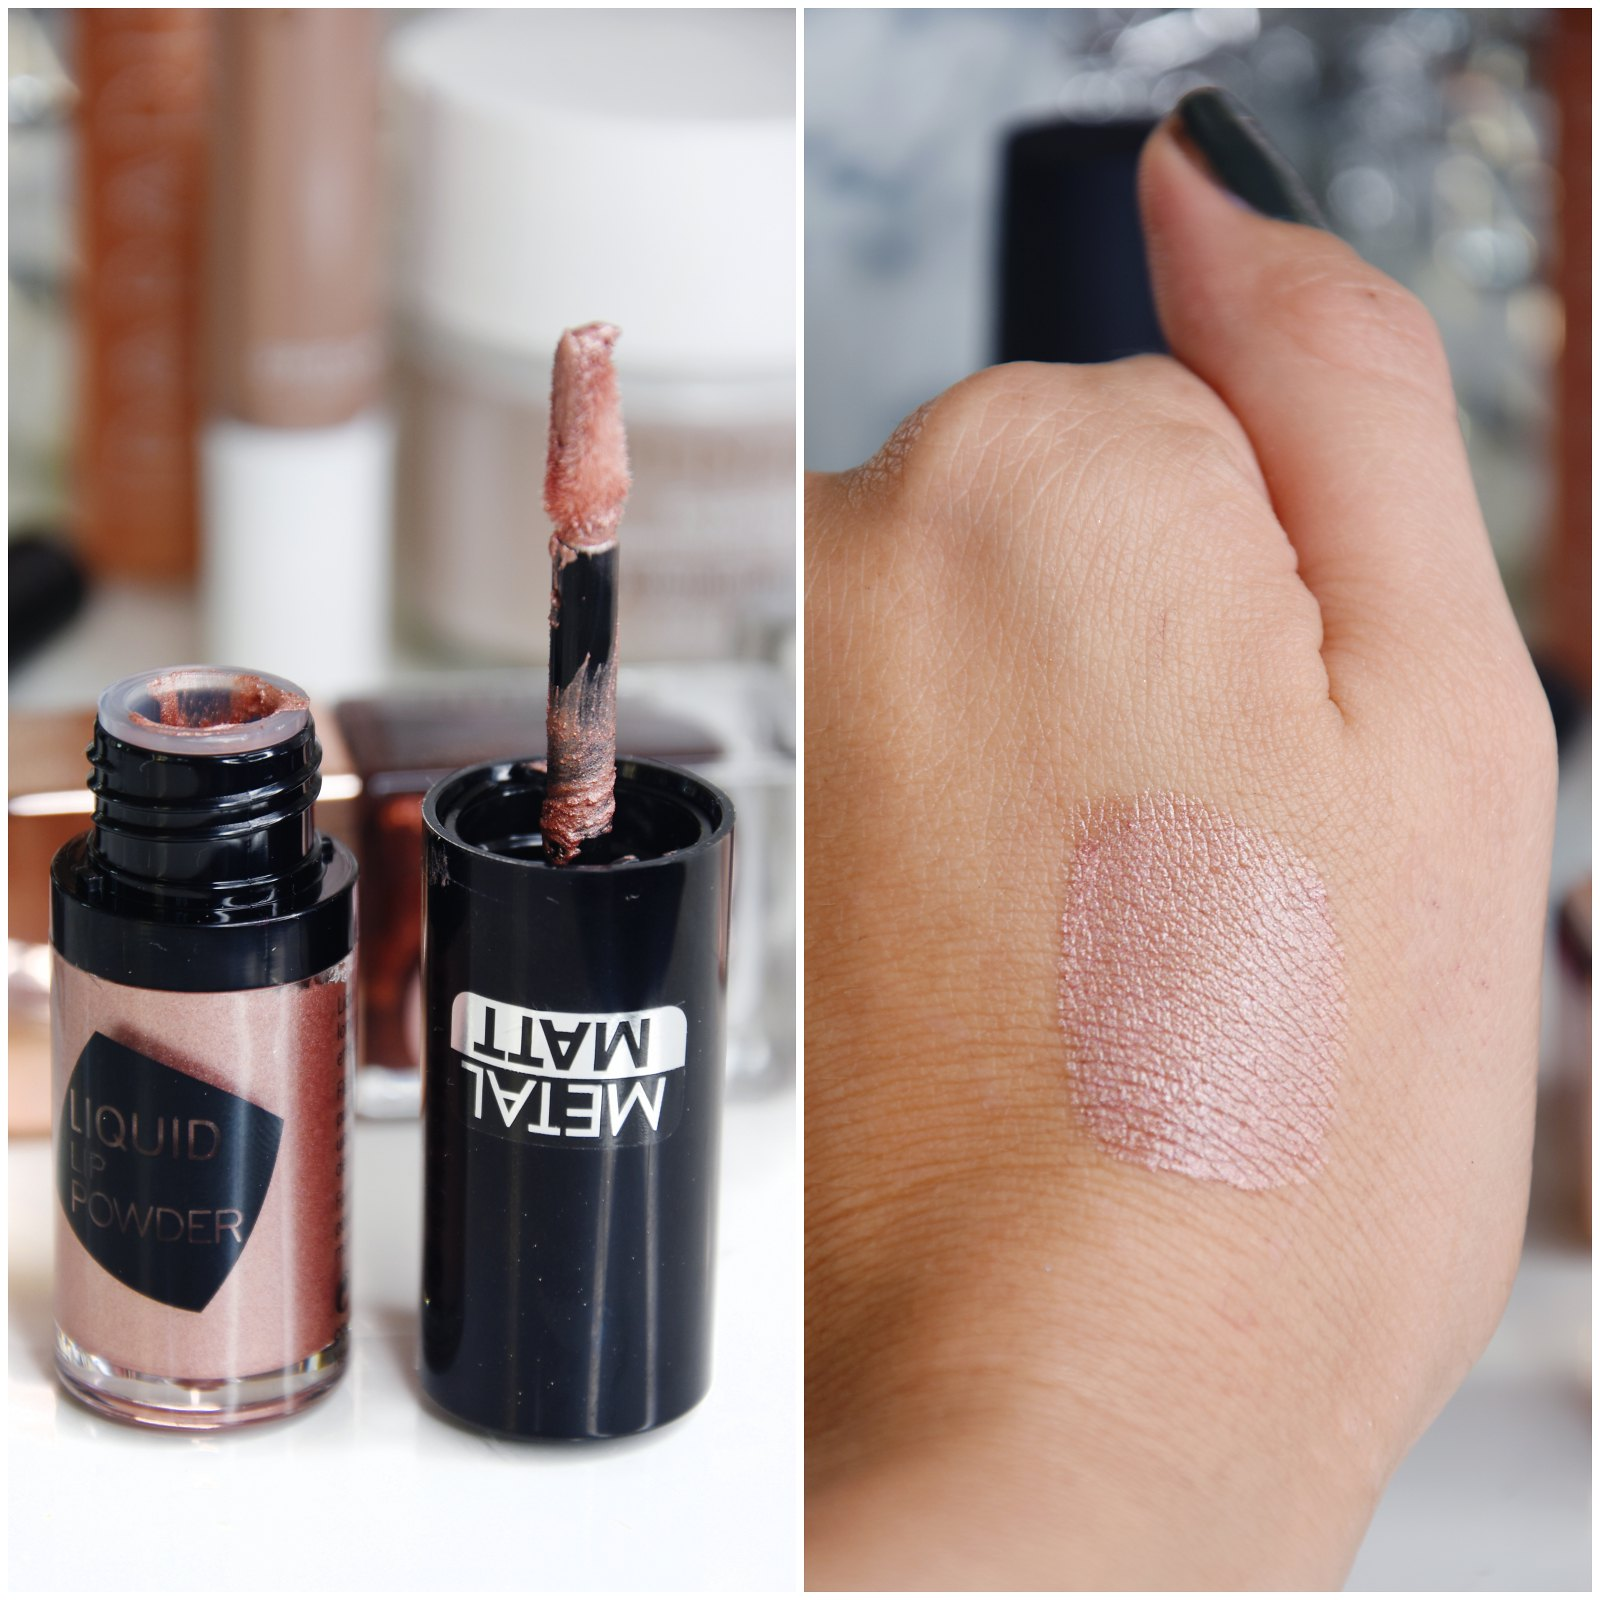 Catrice Liquid Lip Powder review